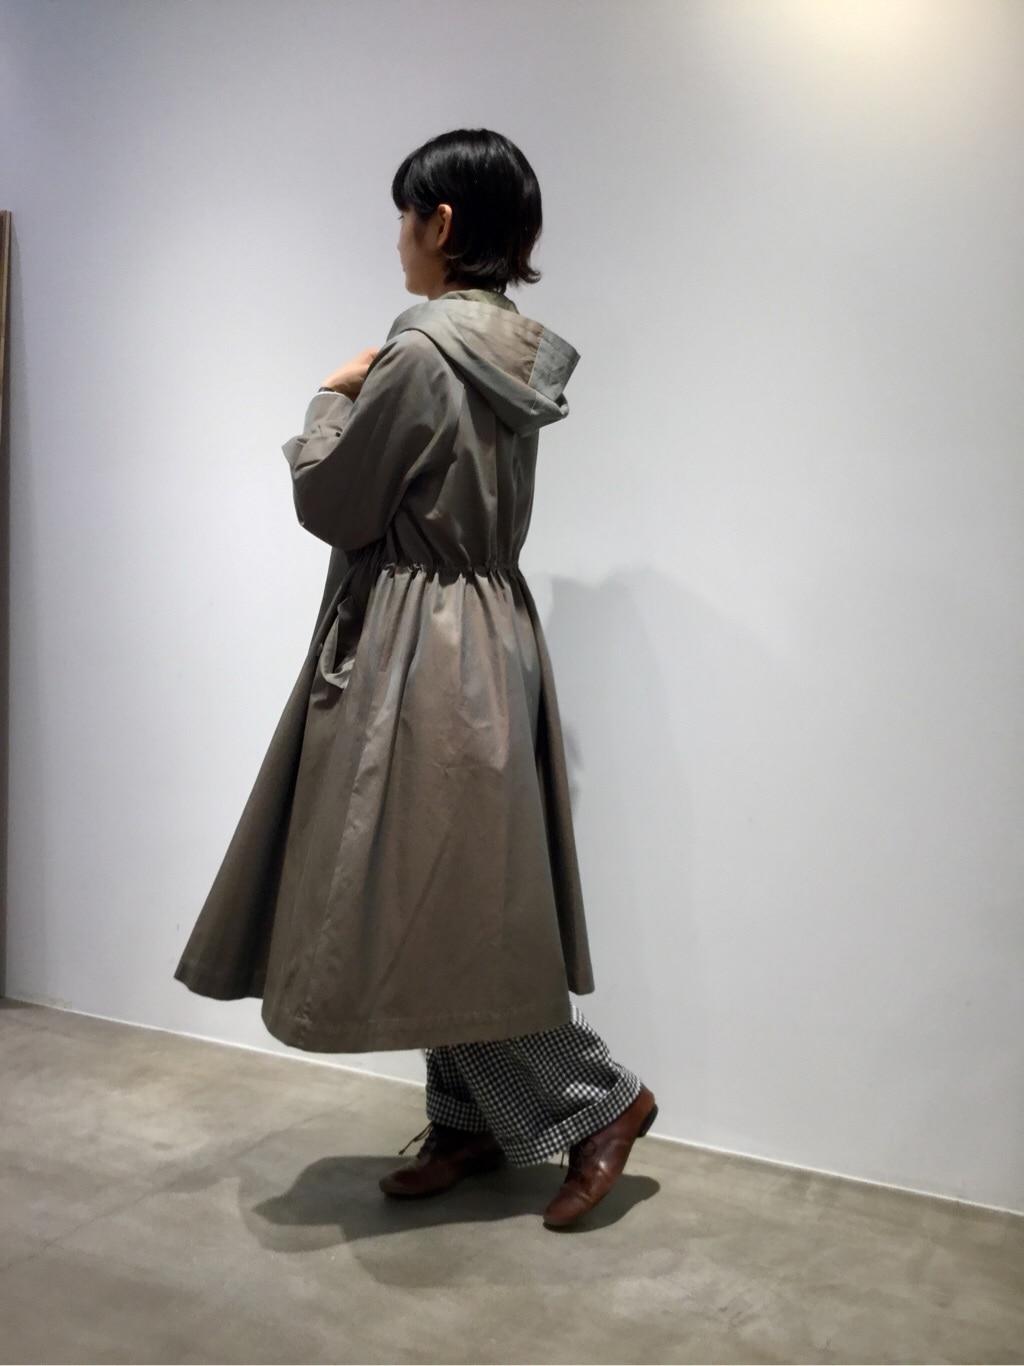 yuni / bulle de savon 京都路面 身長:159cm 2020.09.17